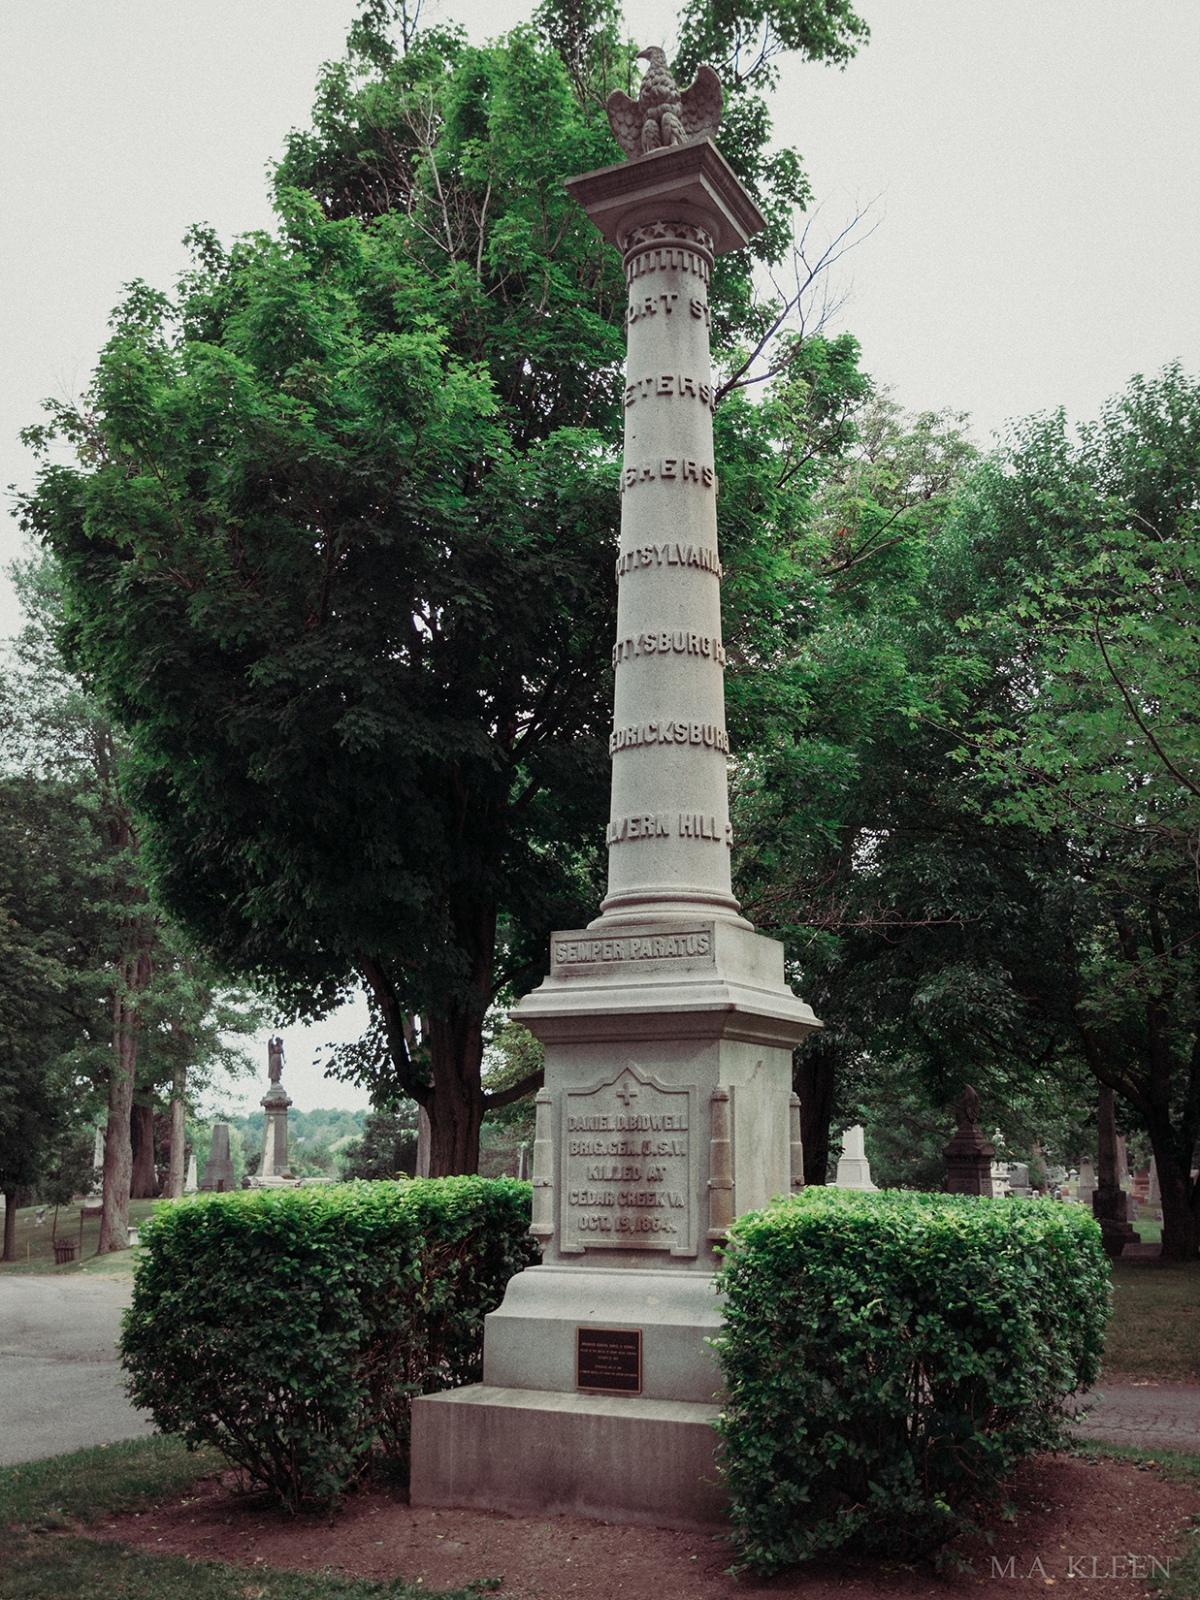 Monument to Brig. Gen. Daniel Davidson Bidwell (1819-1864) in Forest Lawn Cemetery, at 1411 Delaware Avenue in Buffalo, New York.